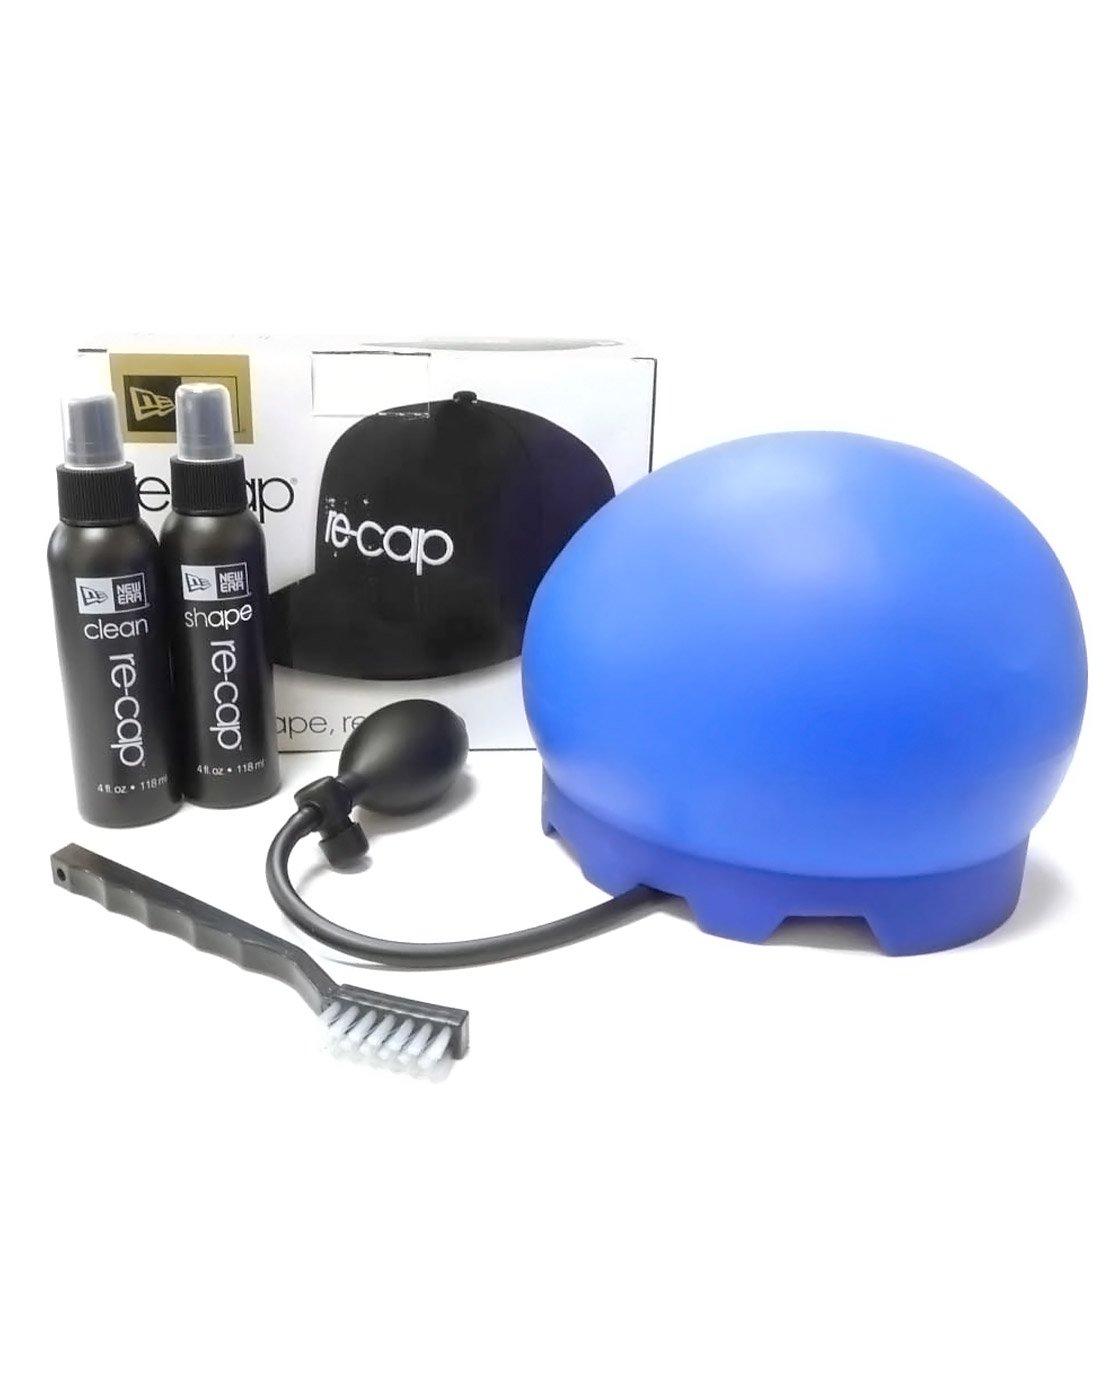 New Era Re-Cap Cleaning Kit  Amazon.co.uk  Grocery 1f2561e2e57